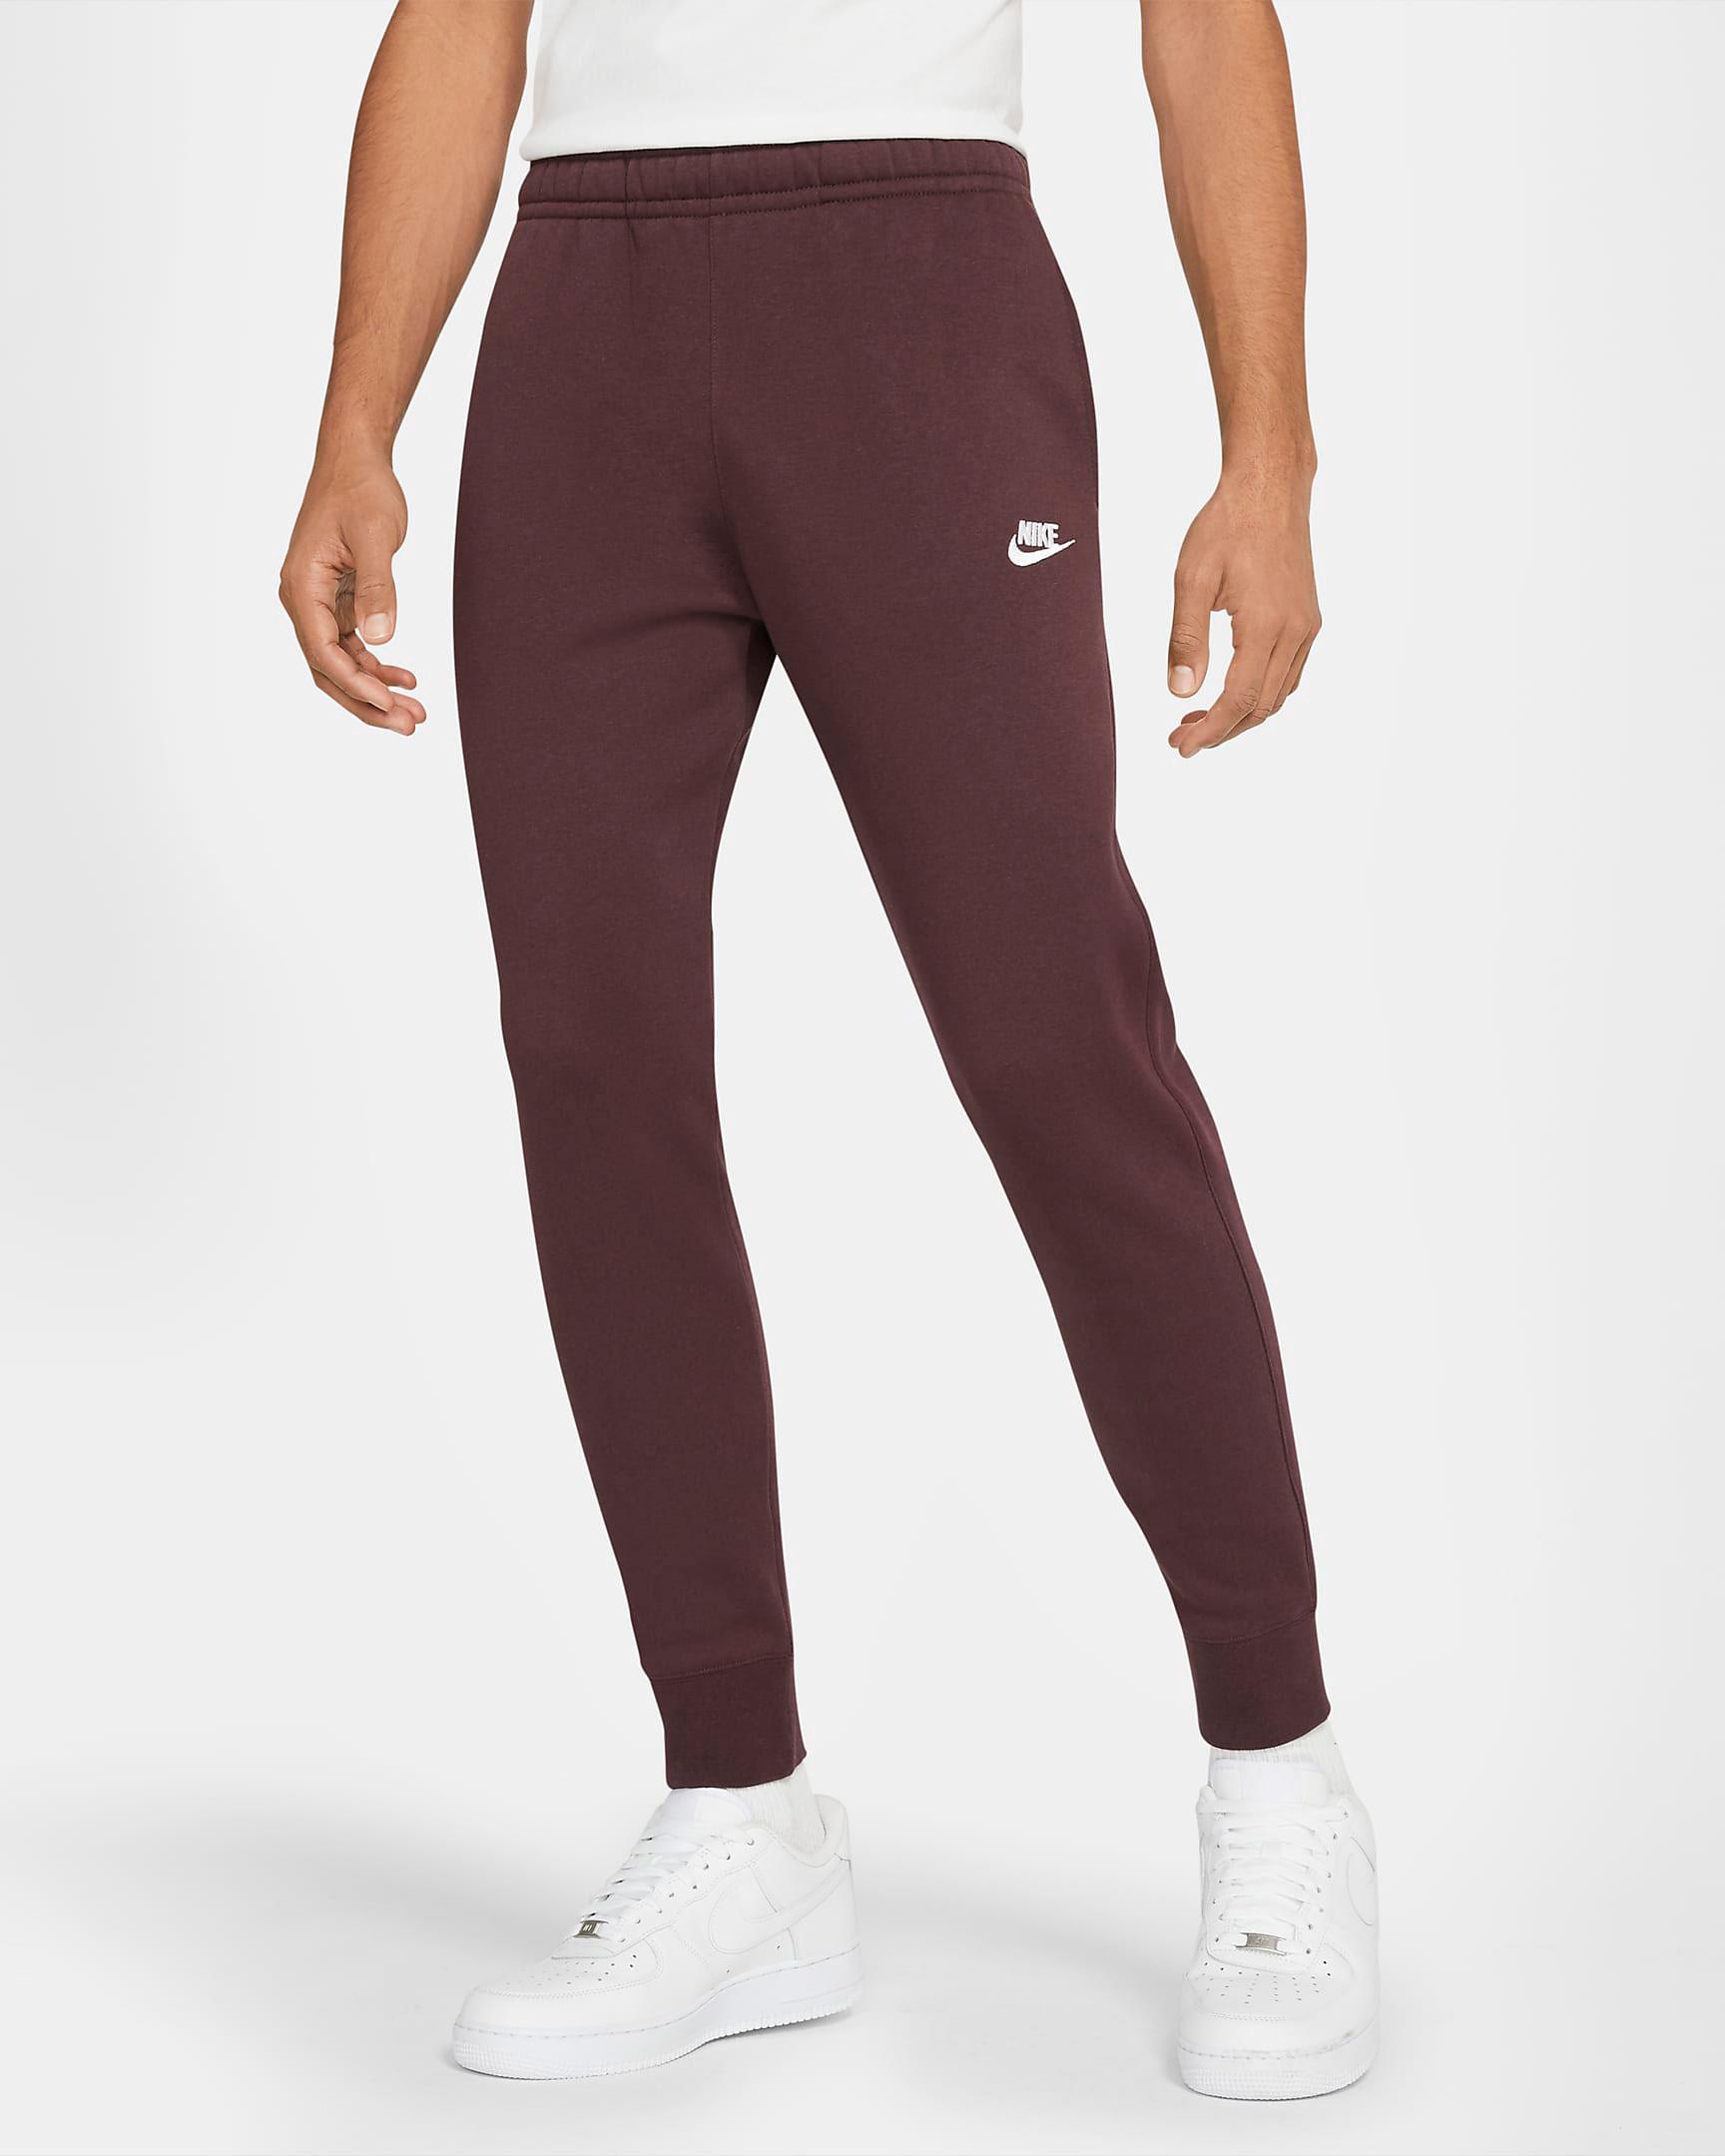 nike-club-fleece-jogger-pants-mahogany-brown